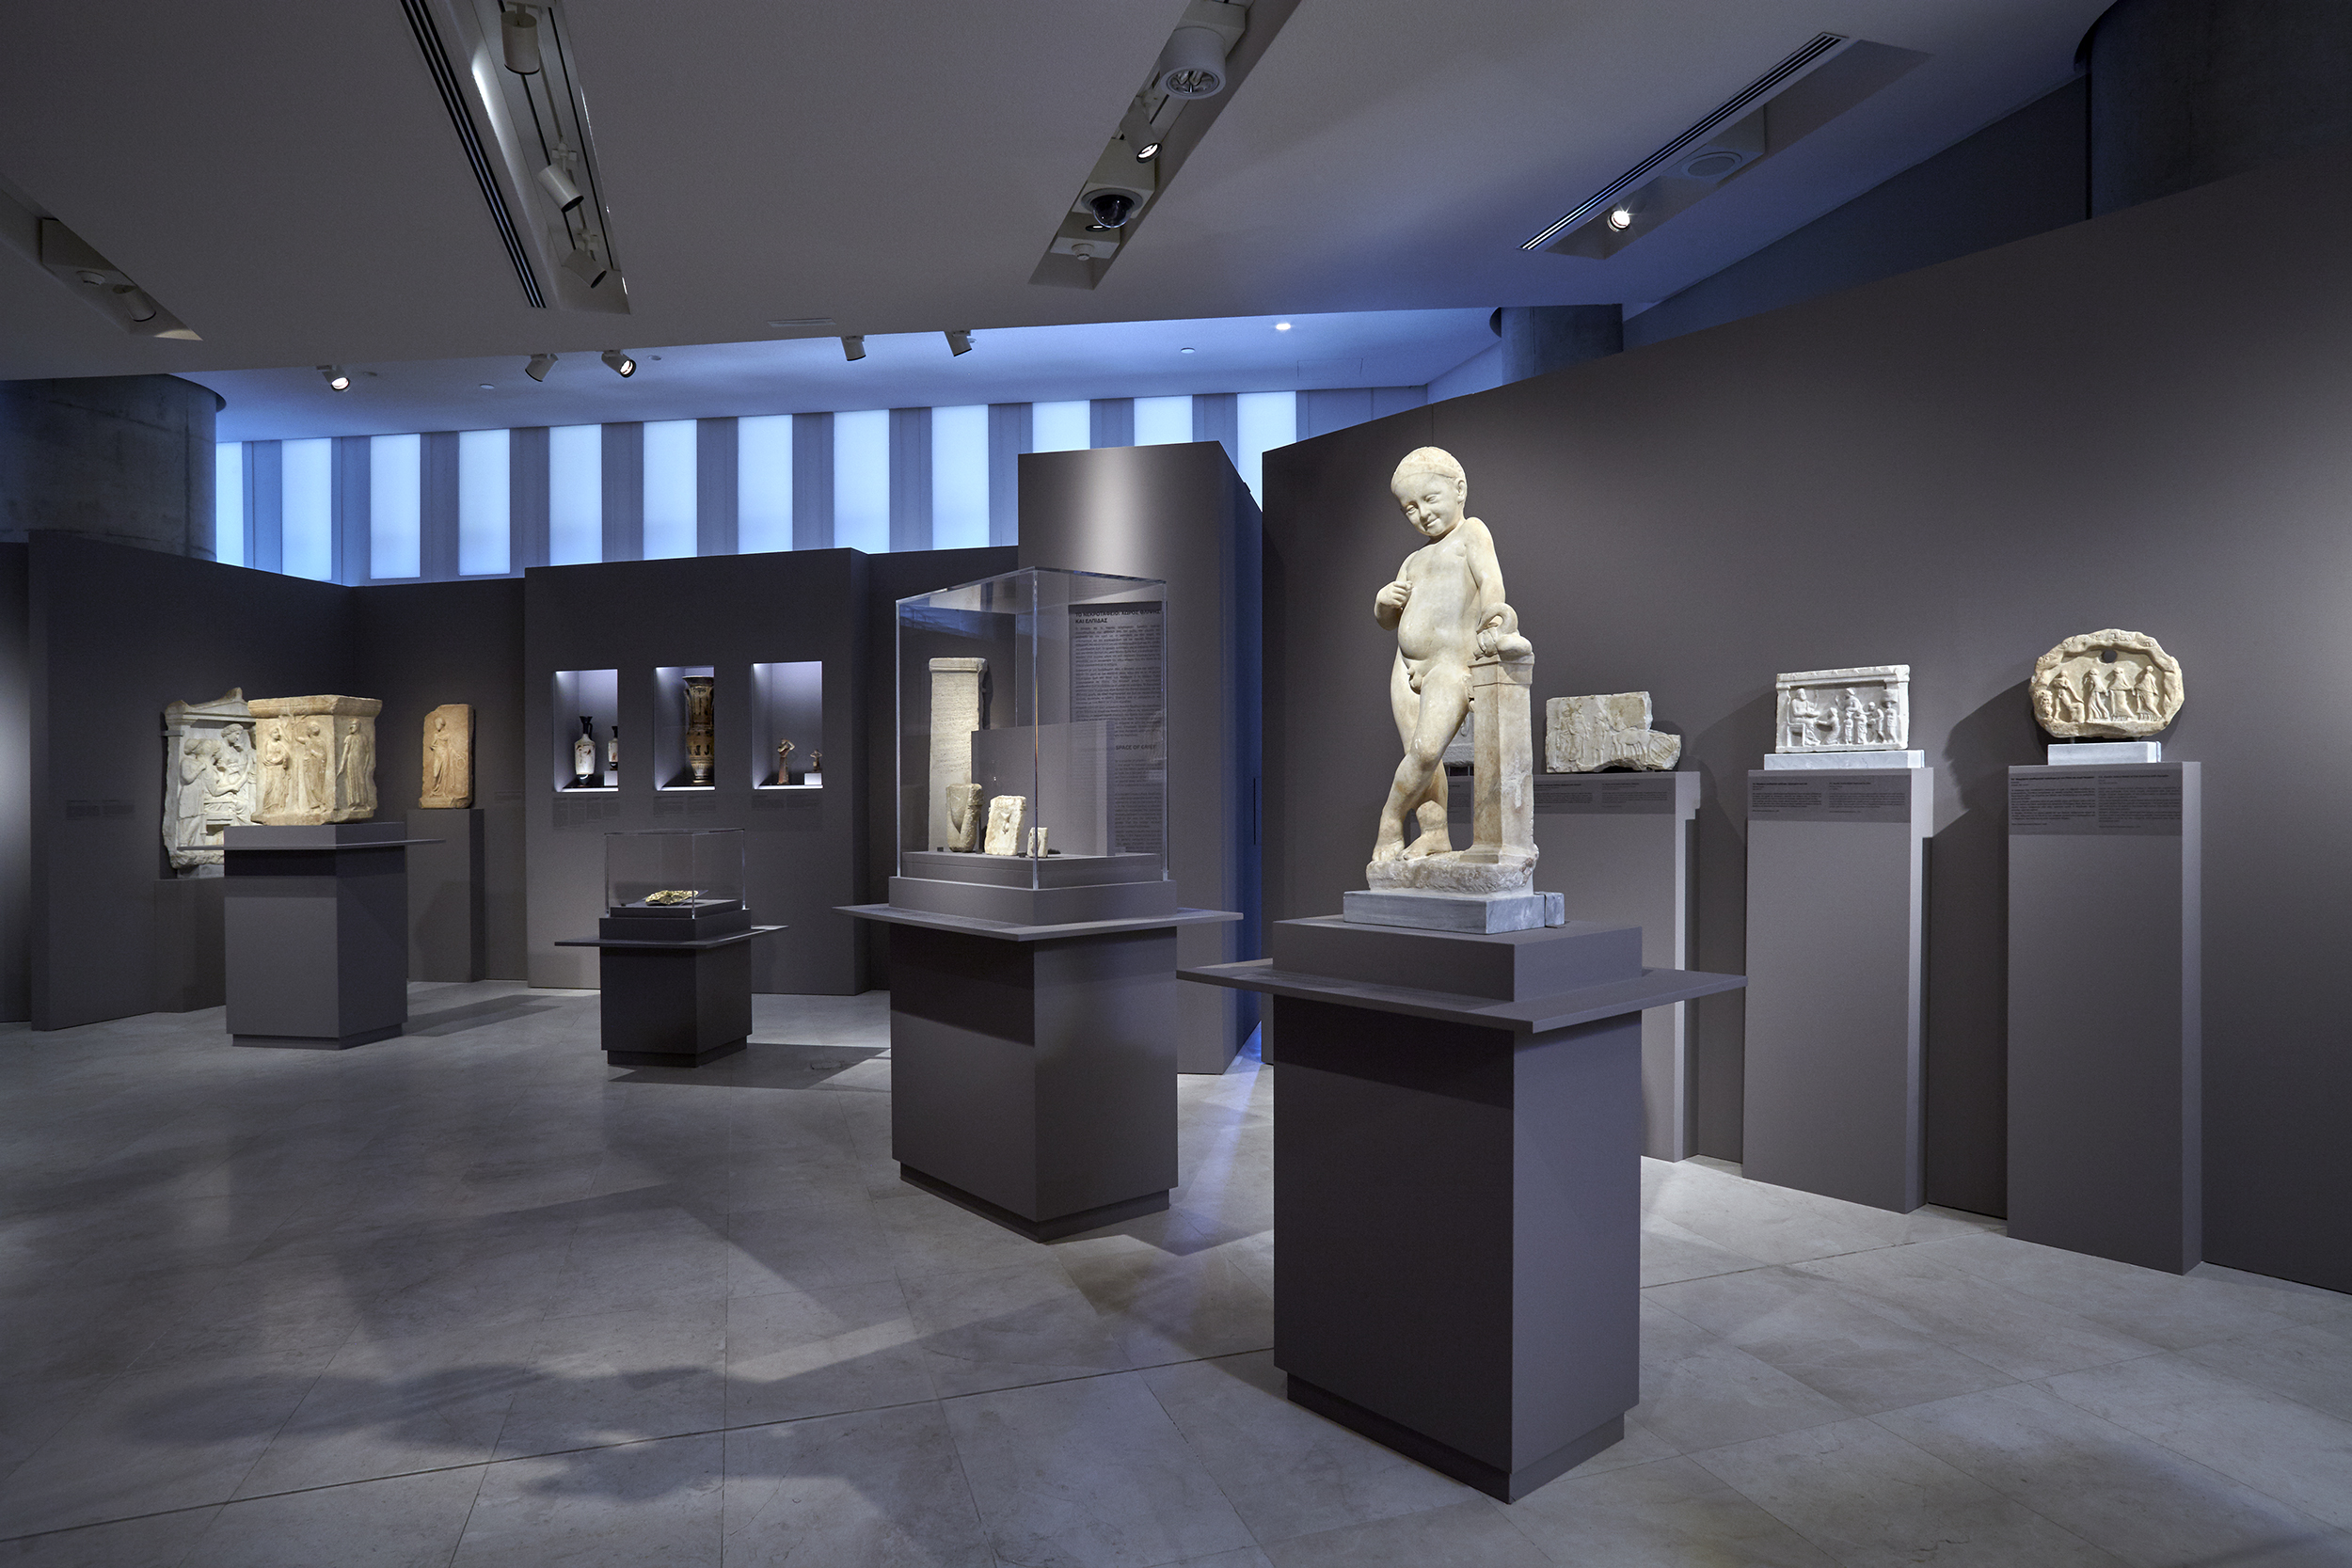 A World of Emotions: Ancient Greece 700 BC - 200 AD - ©Γιώργος Βιτσαρόπουλος